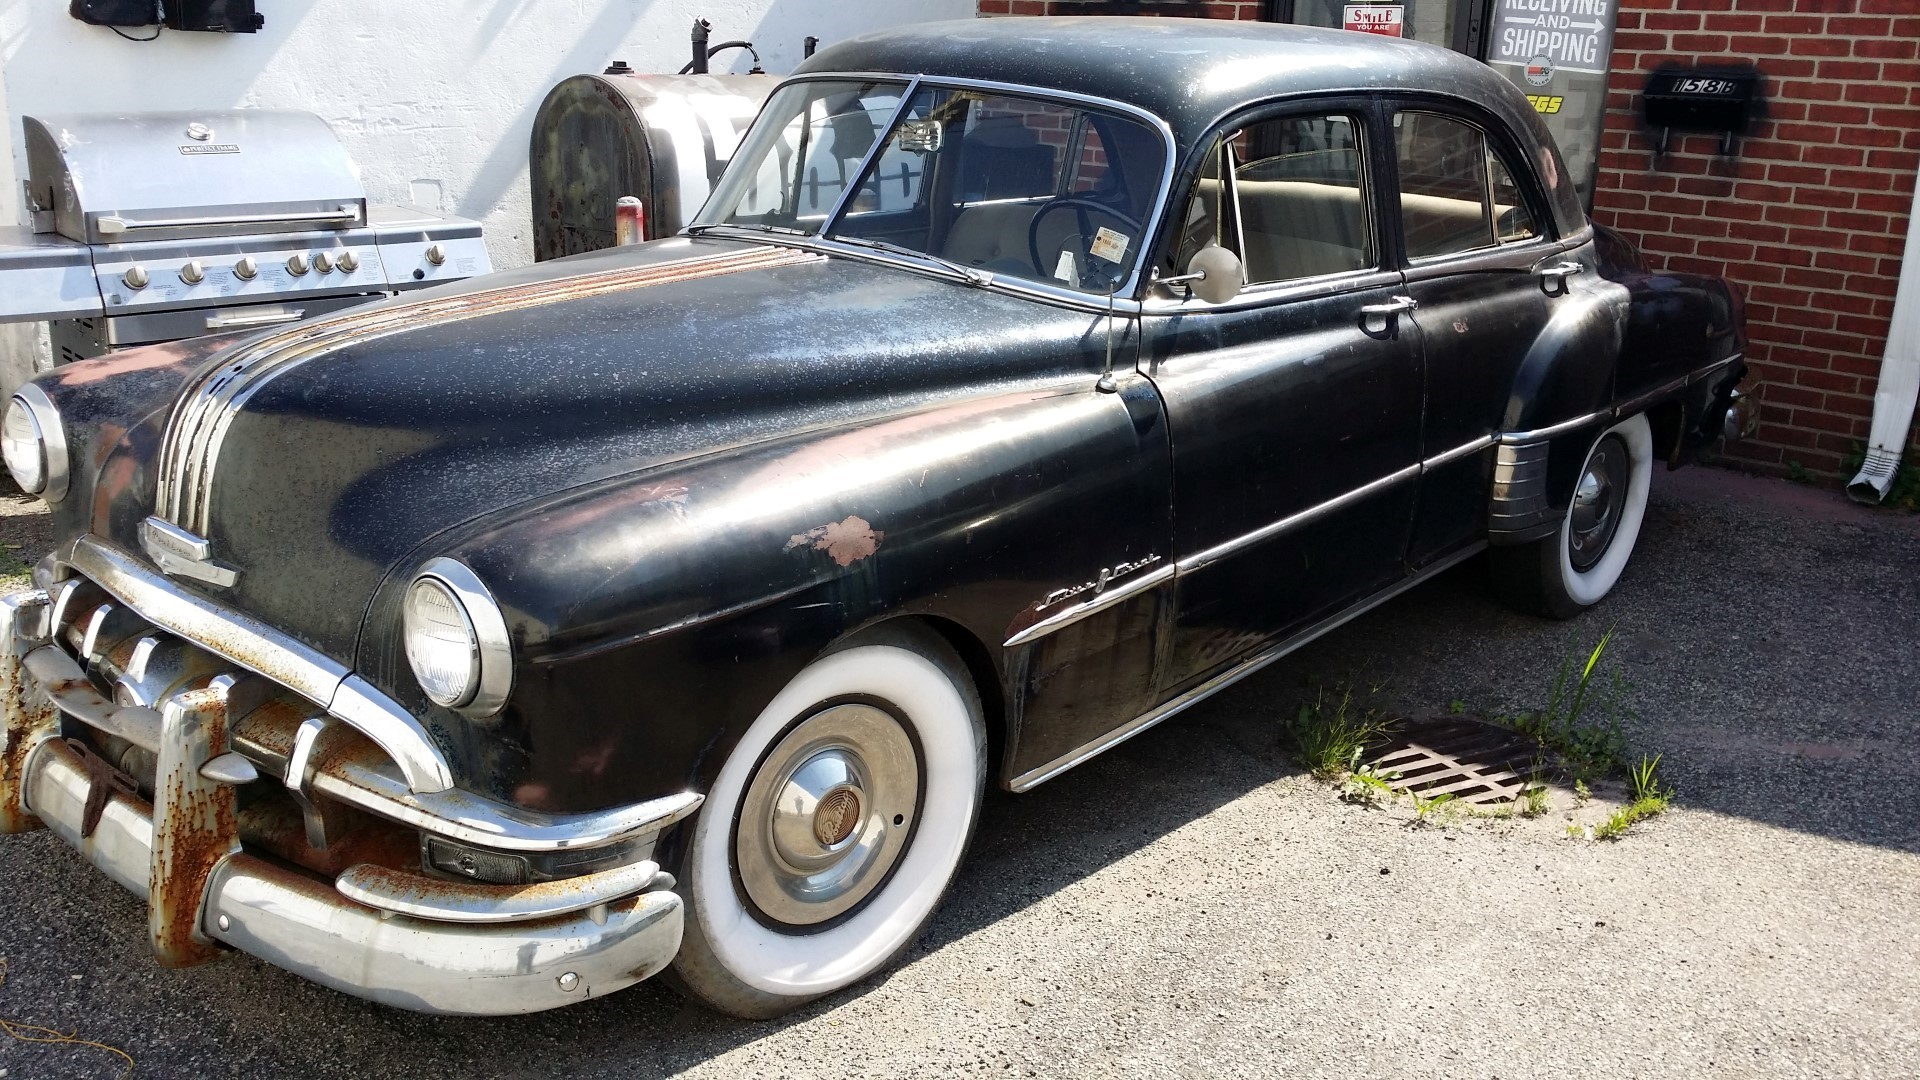 1950 Pontiac Chieftain Eight Deluxe Sedan (42)